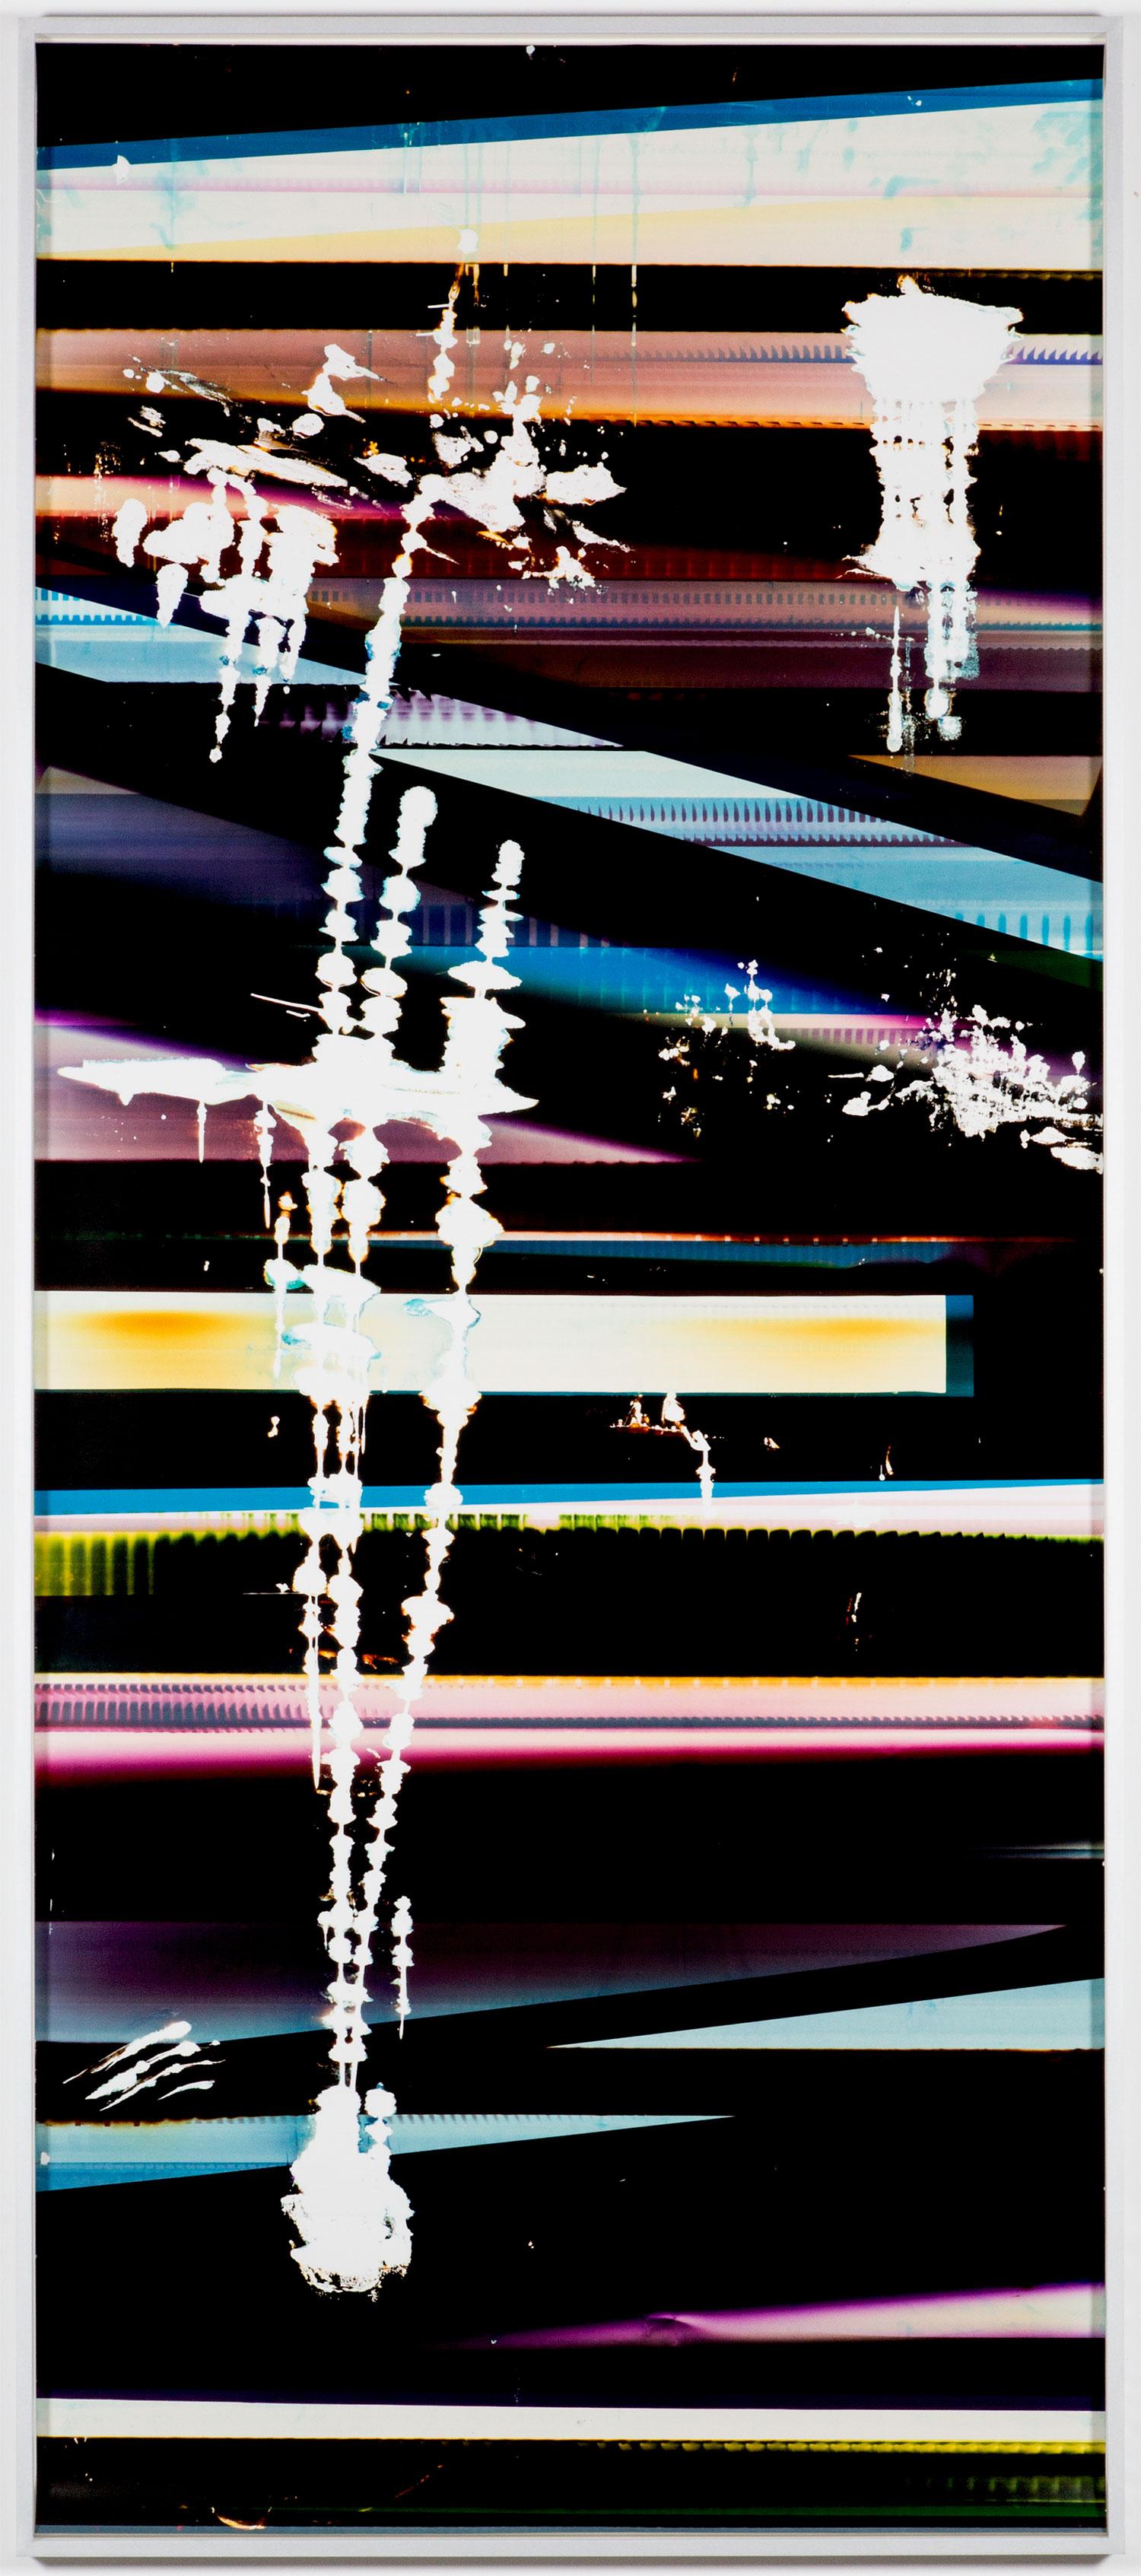 Cross-Contaminated RA4 Contact Print (9:6/CYM/Six Magnet: Los Angeles, California, January 27, 2014, Fuji Color Crystal Archive Super Type C, Em. No. 101-006, Kodak Ektacolor RA Bleach-Fix and Replenisher, Cat. No. 847 1484, 06214), Kreonite KM IV 5225 RA4 Color Processor, Ser. No. 00092174    2016   Color photographic paper  119 3/4 x51 1/2 inches   RA4 Contact Prints, 2014–